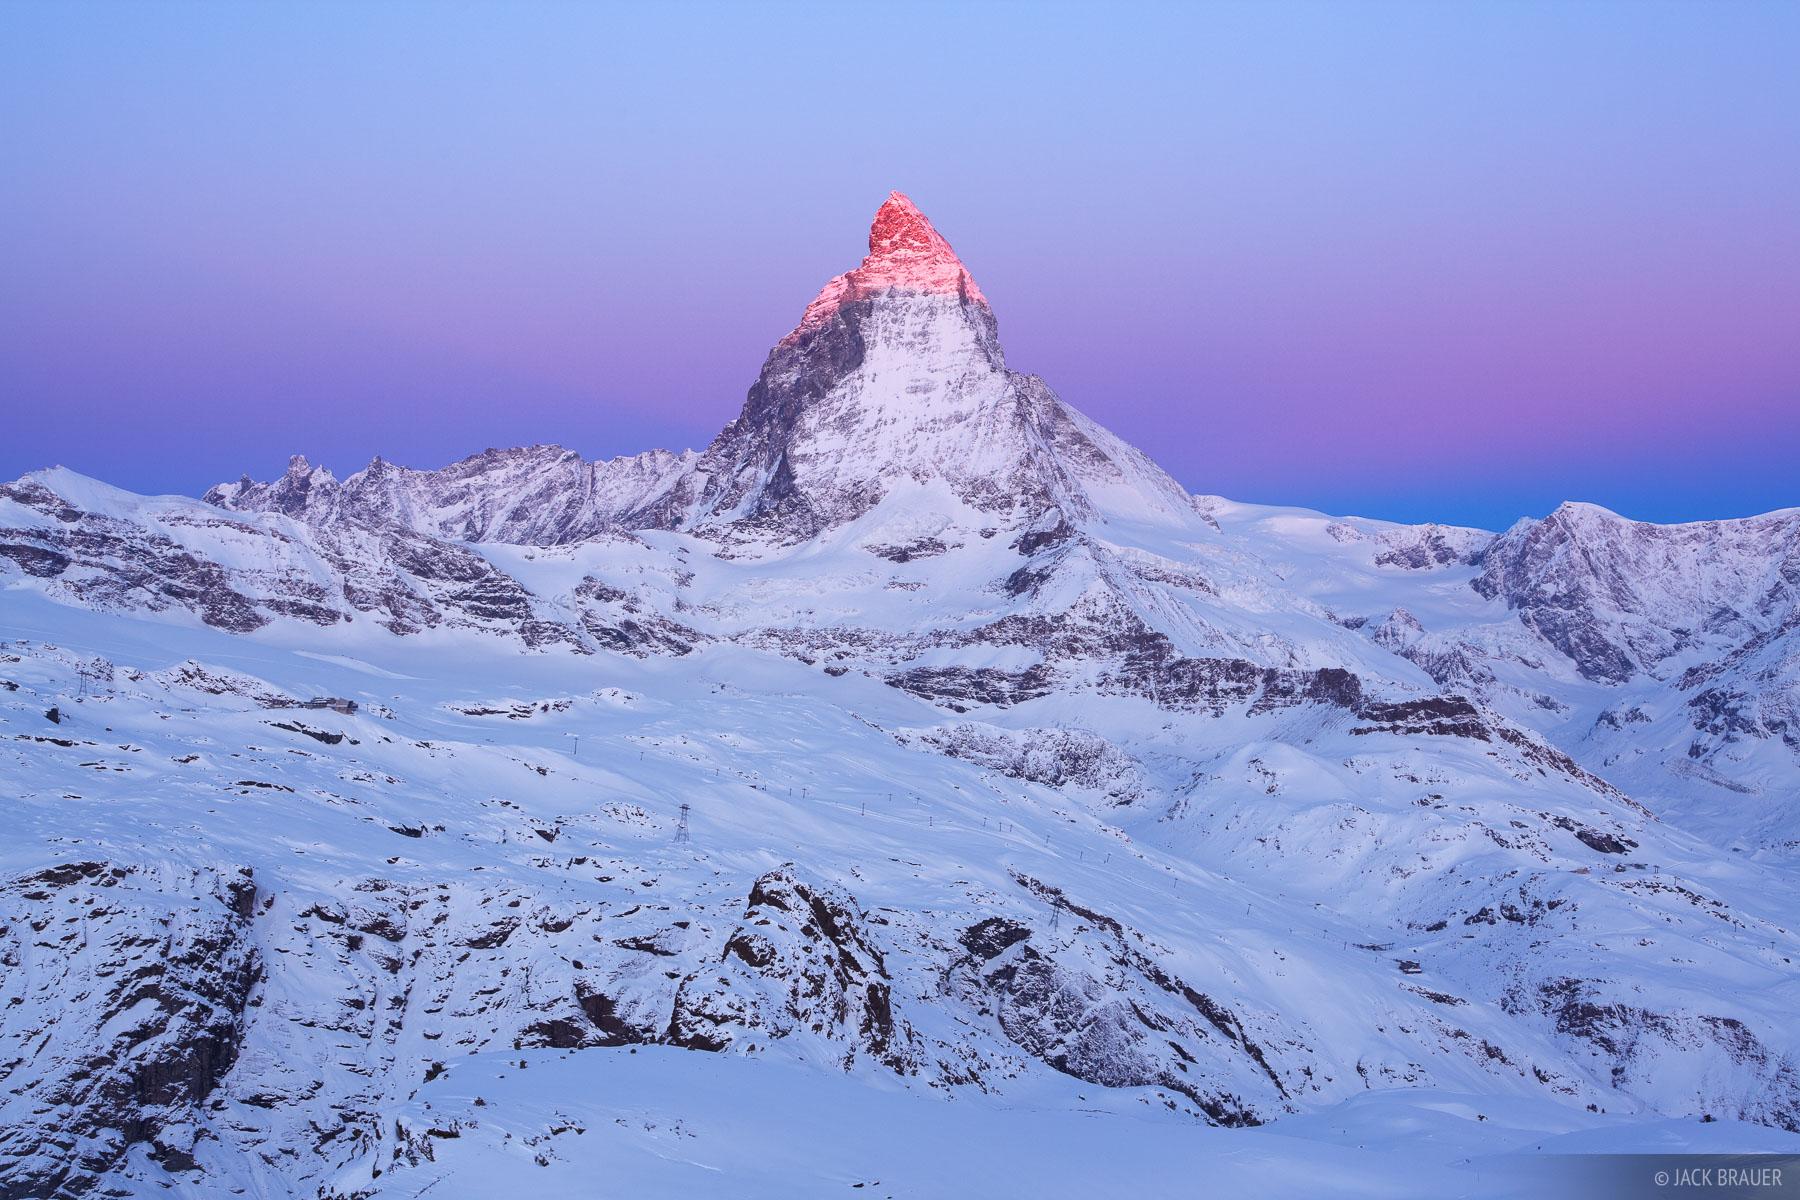 Sunrise alpenglow paints the summit of theMatterhorn (4478m / 14,692 ft.), as seen from Gornergrat.